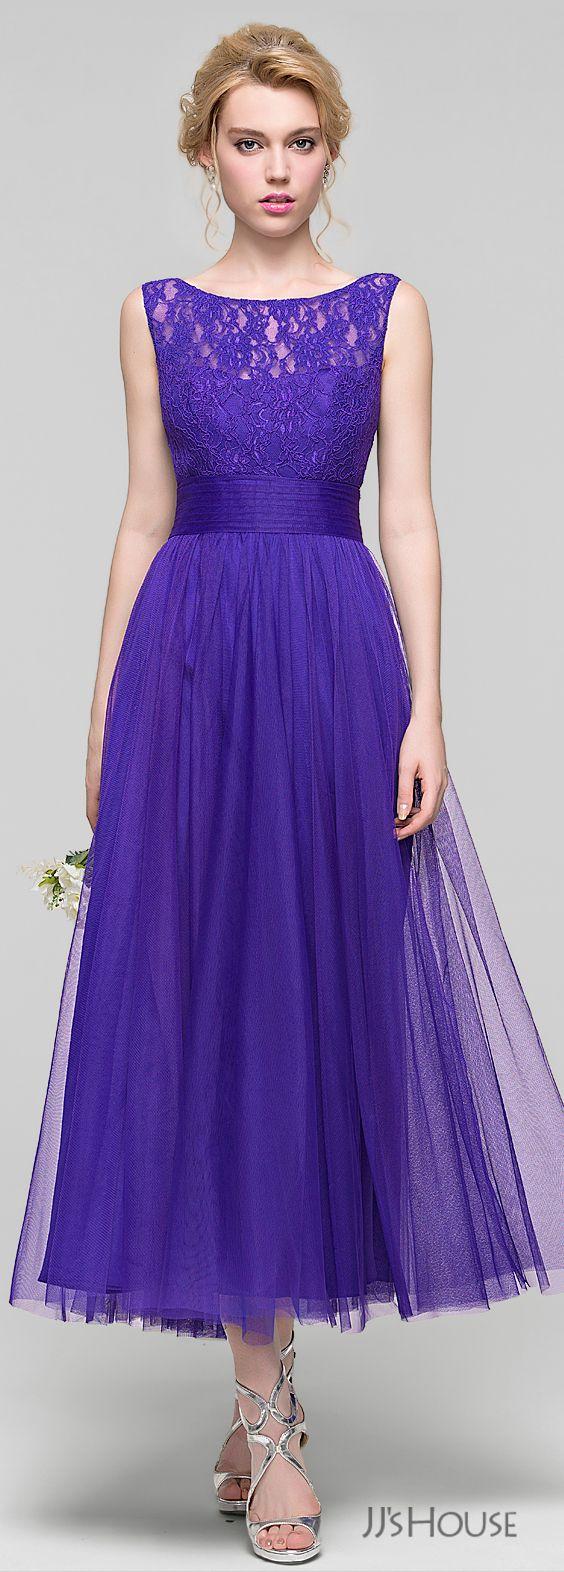 JJsHouse #Bridesmaid   All things purple.   Pinterest   Vestiditos ...